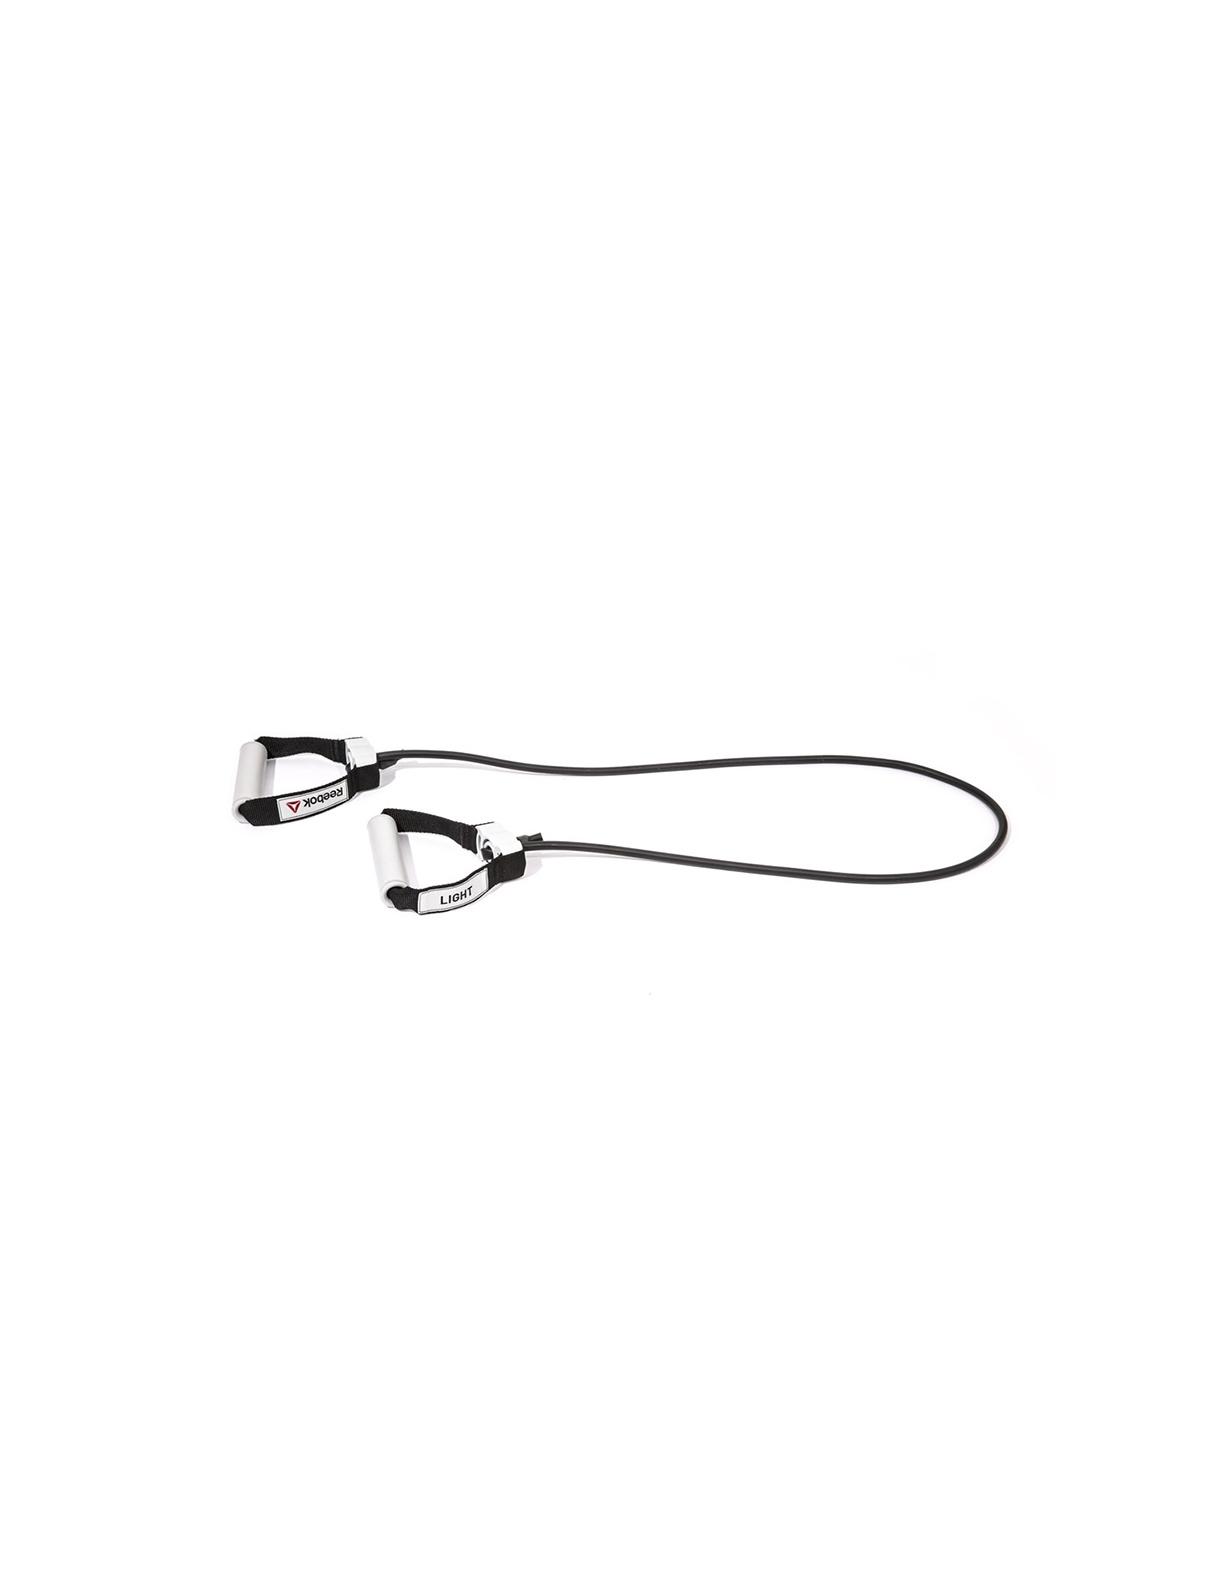 RSTB-16075  Adjustable Resistance Tube Light